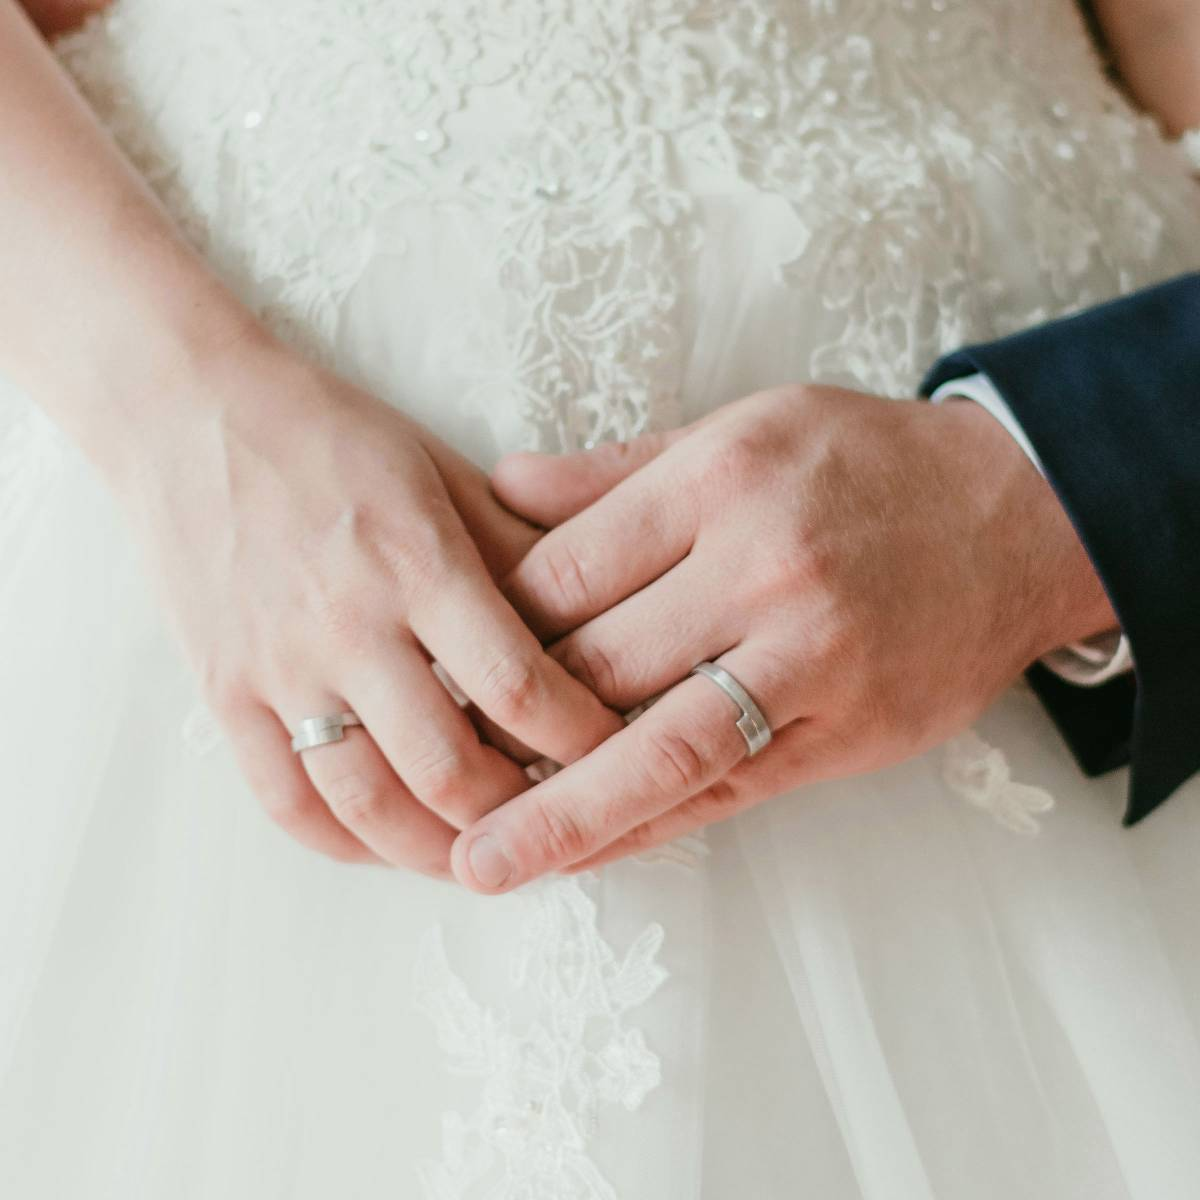 MMAAK - Bruidsjuwelen - Fotograaf Hanne Kelchtermans - House of Weddings 2